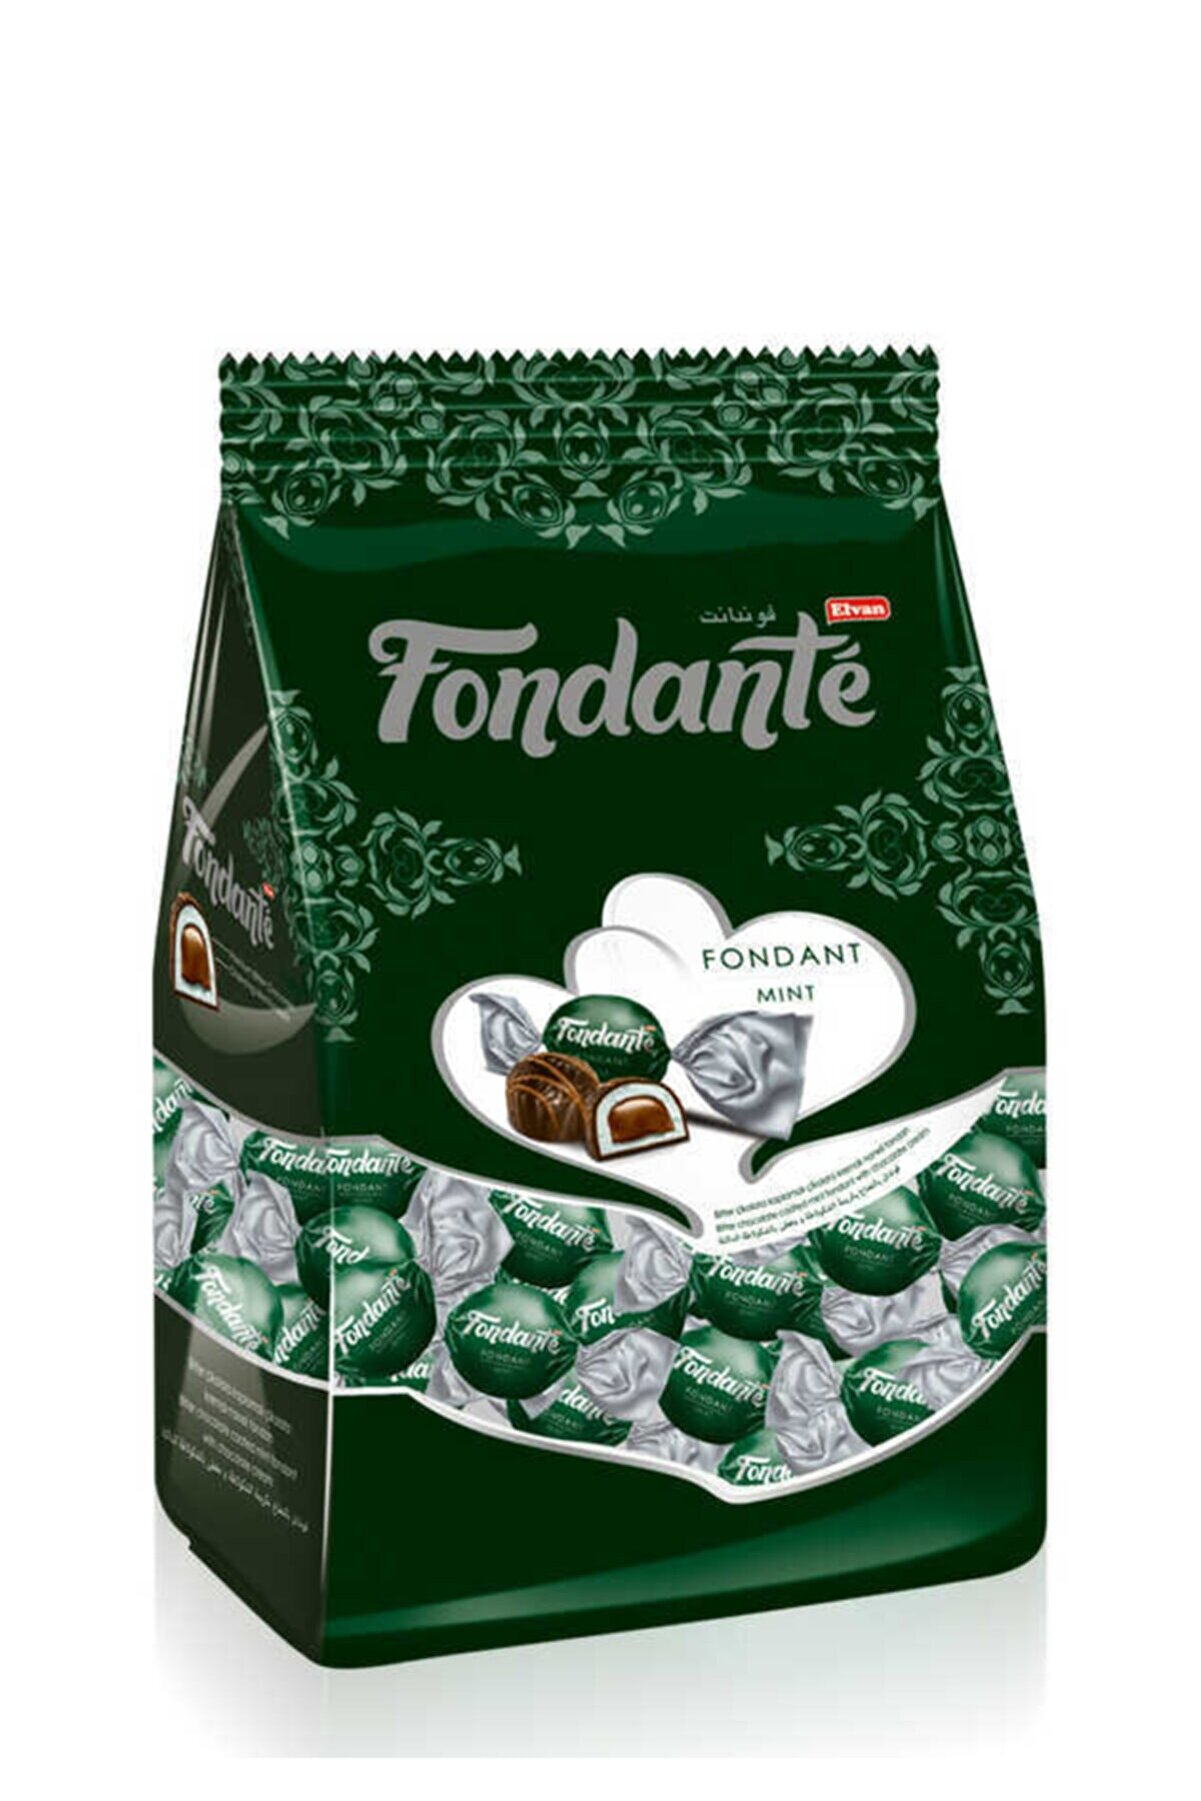 Elvan Fondante Çikolata Dolgulu Naneli 500 Gr. (1 Poşet)